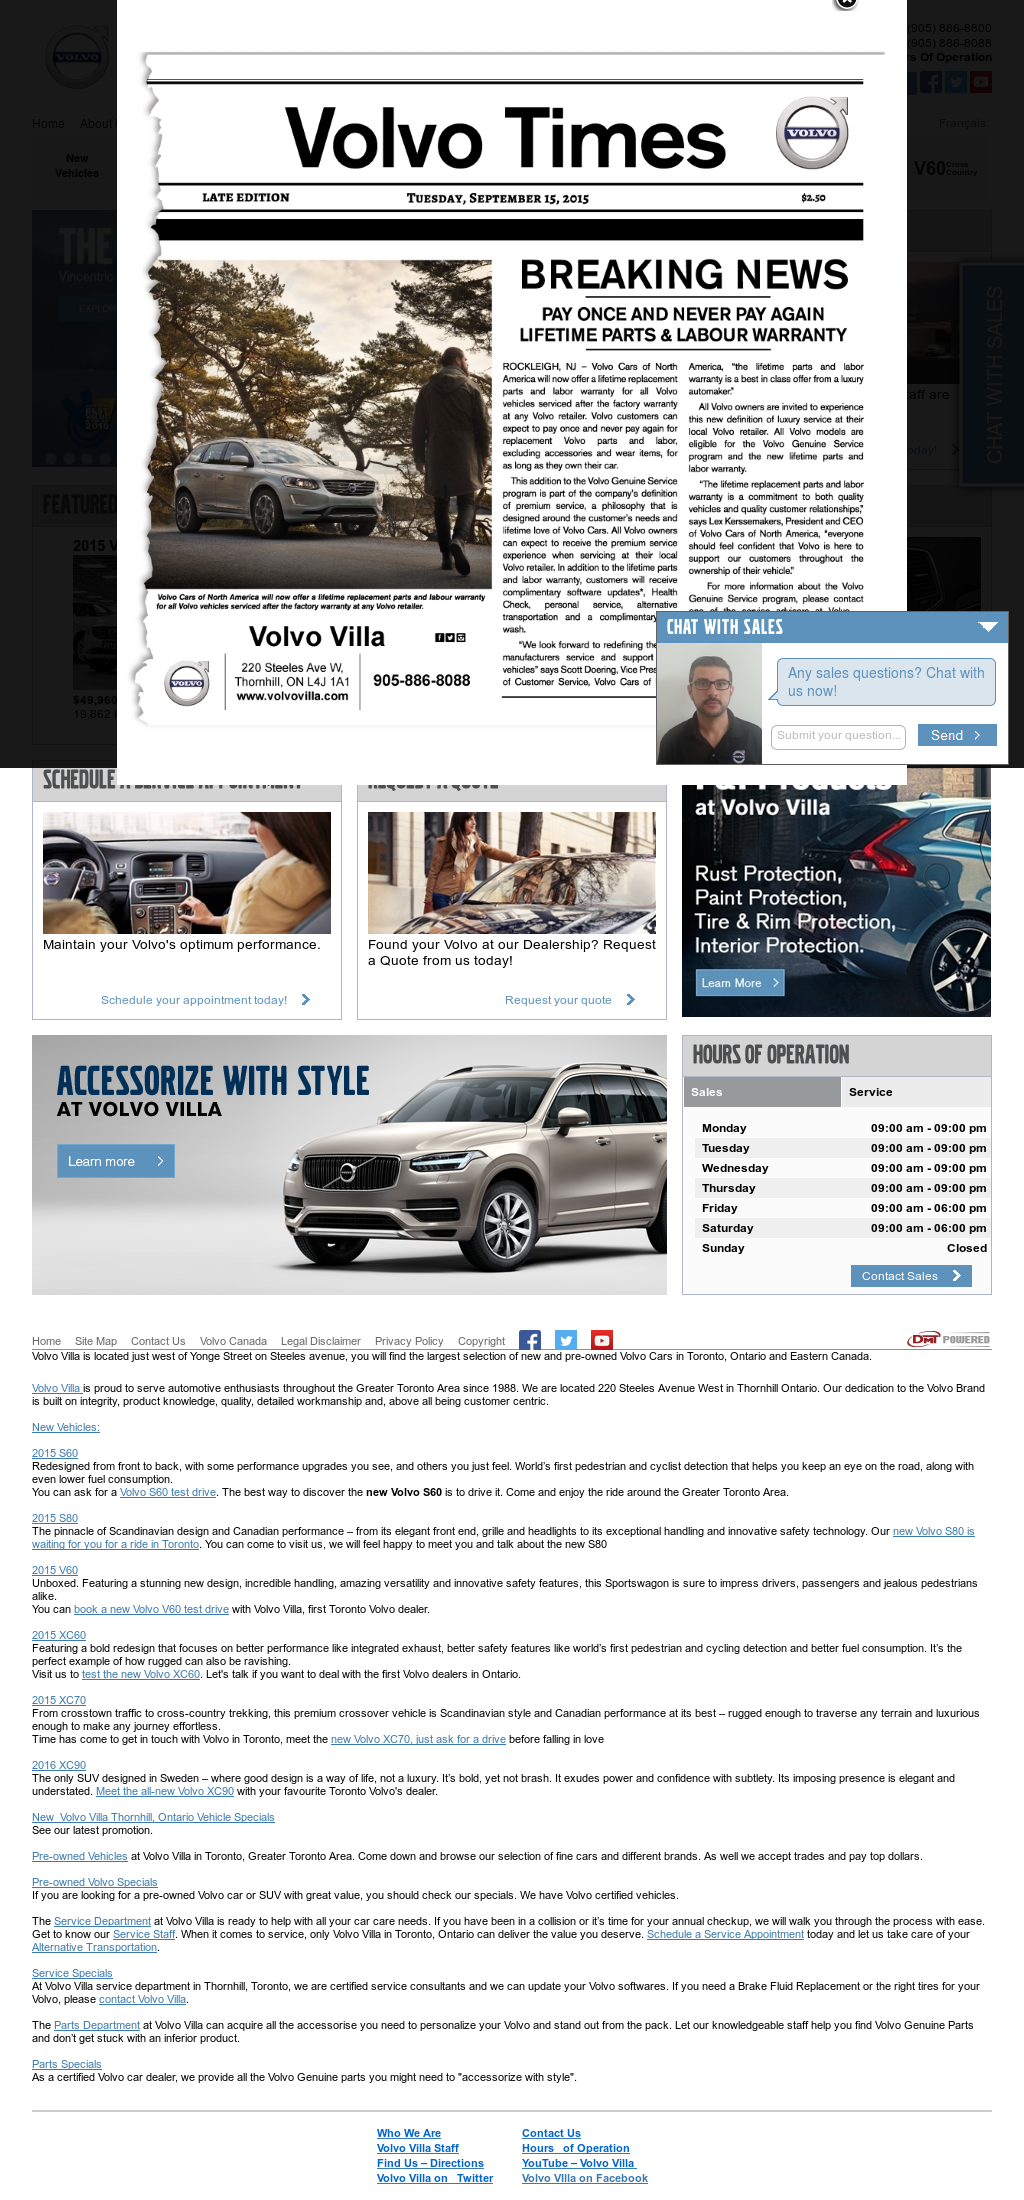 Volvo Villa Competitors, Revenue and Employees - Owler